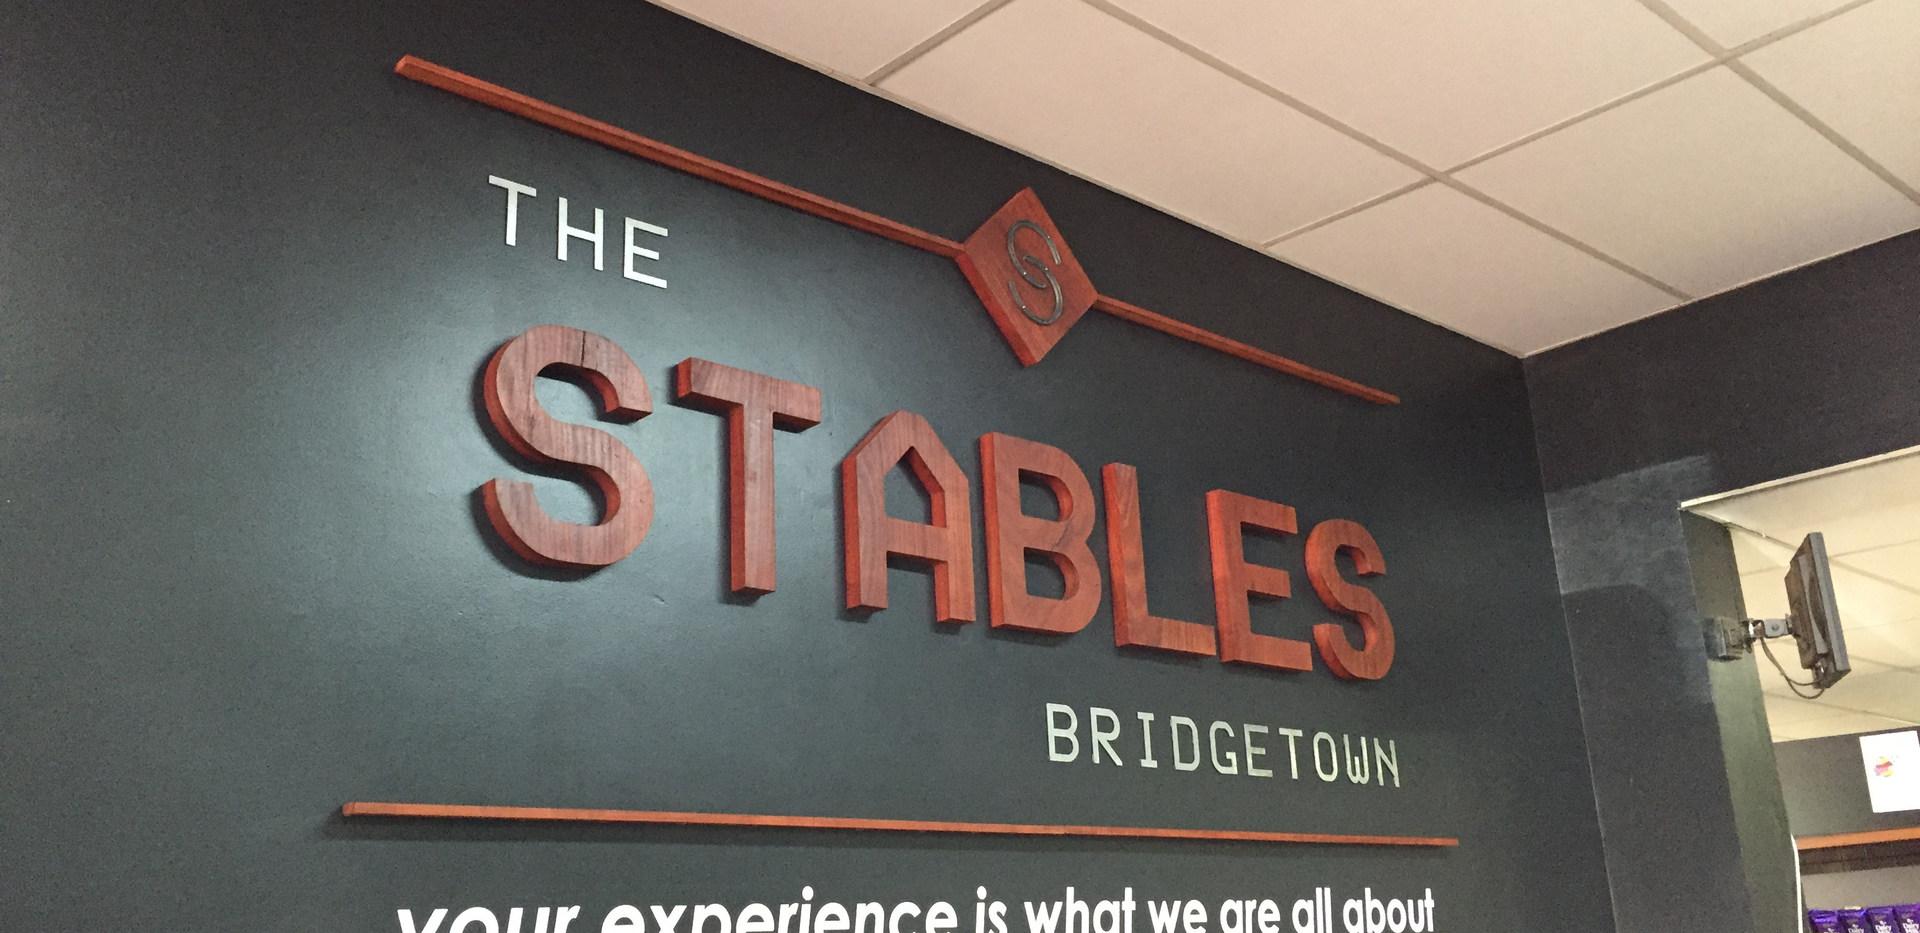 iga-stables-bridgetown-27.jpg